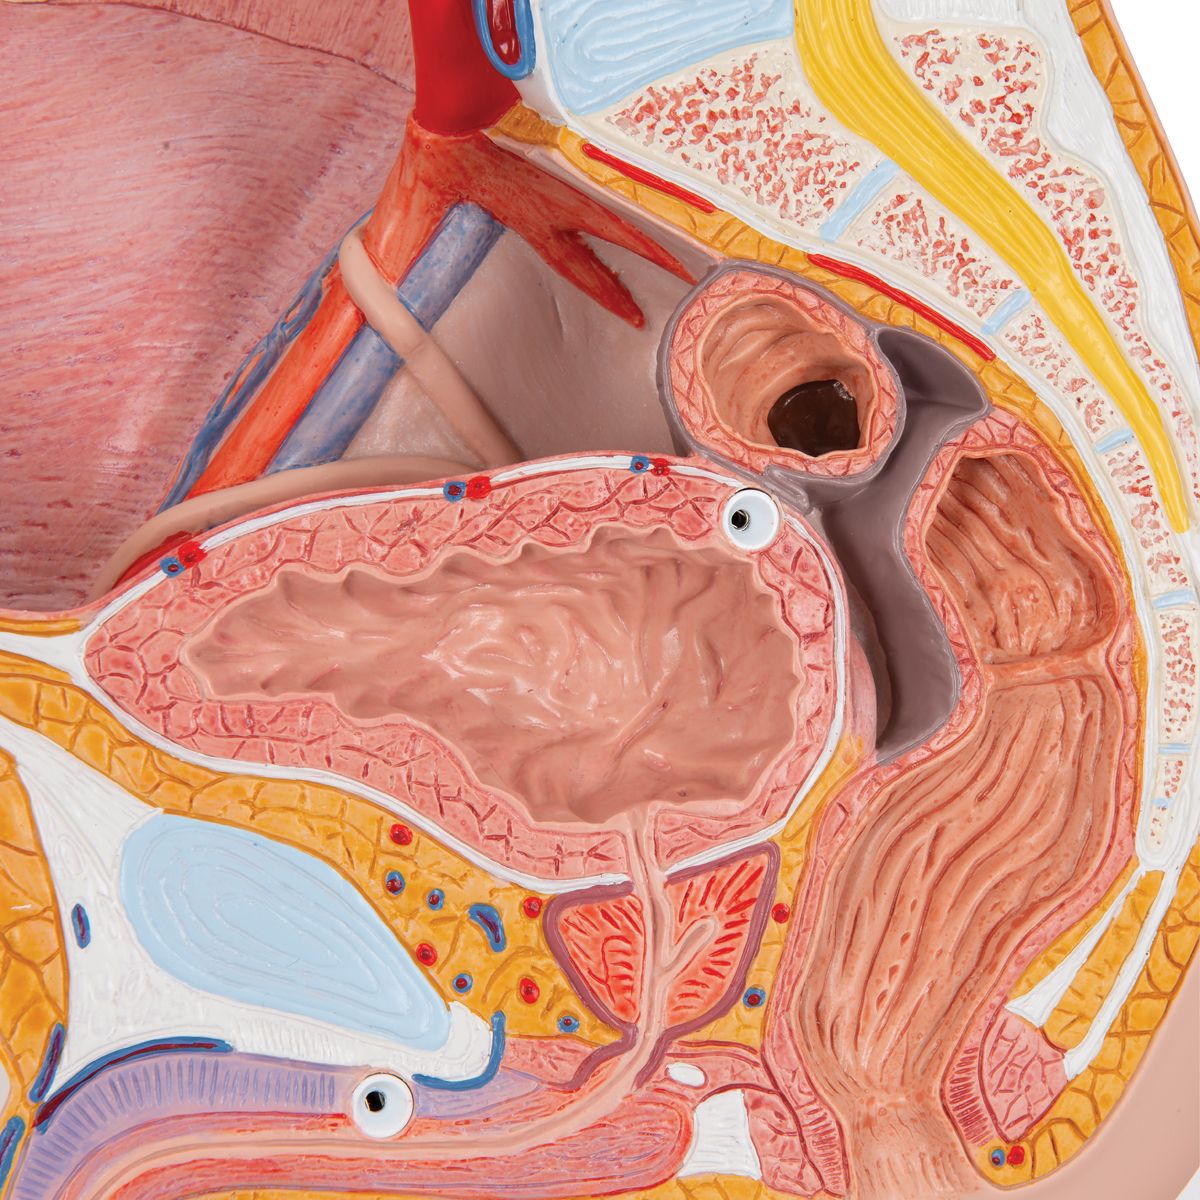 Anatomical Teaching Models Plastic Human Pelvic Models Male